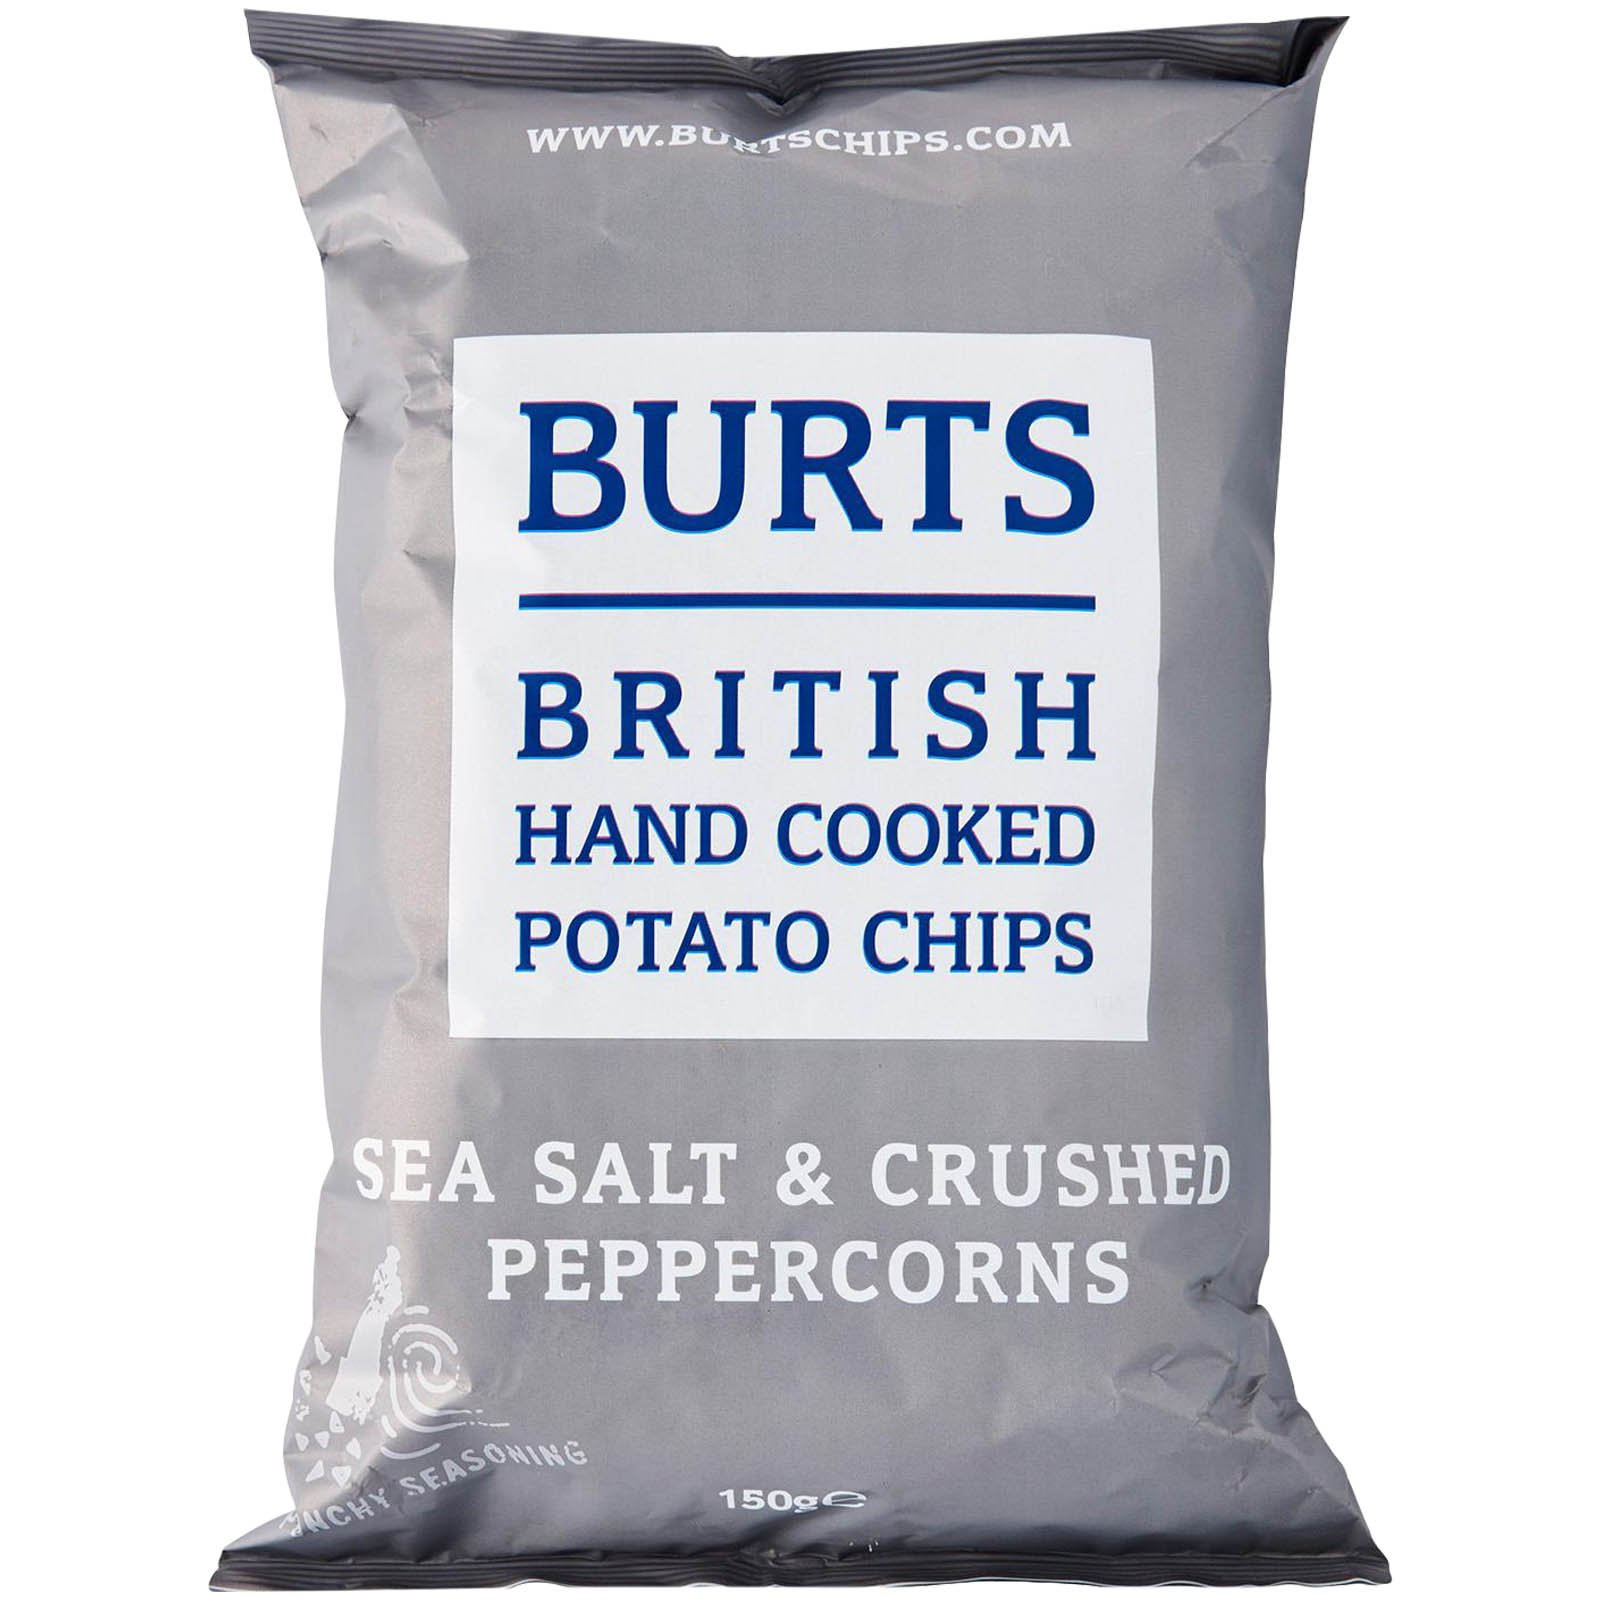 Burts Chips Sea Salt & Crushed Peppercorns 150g